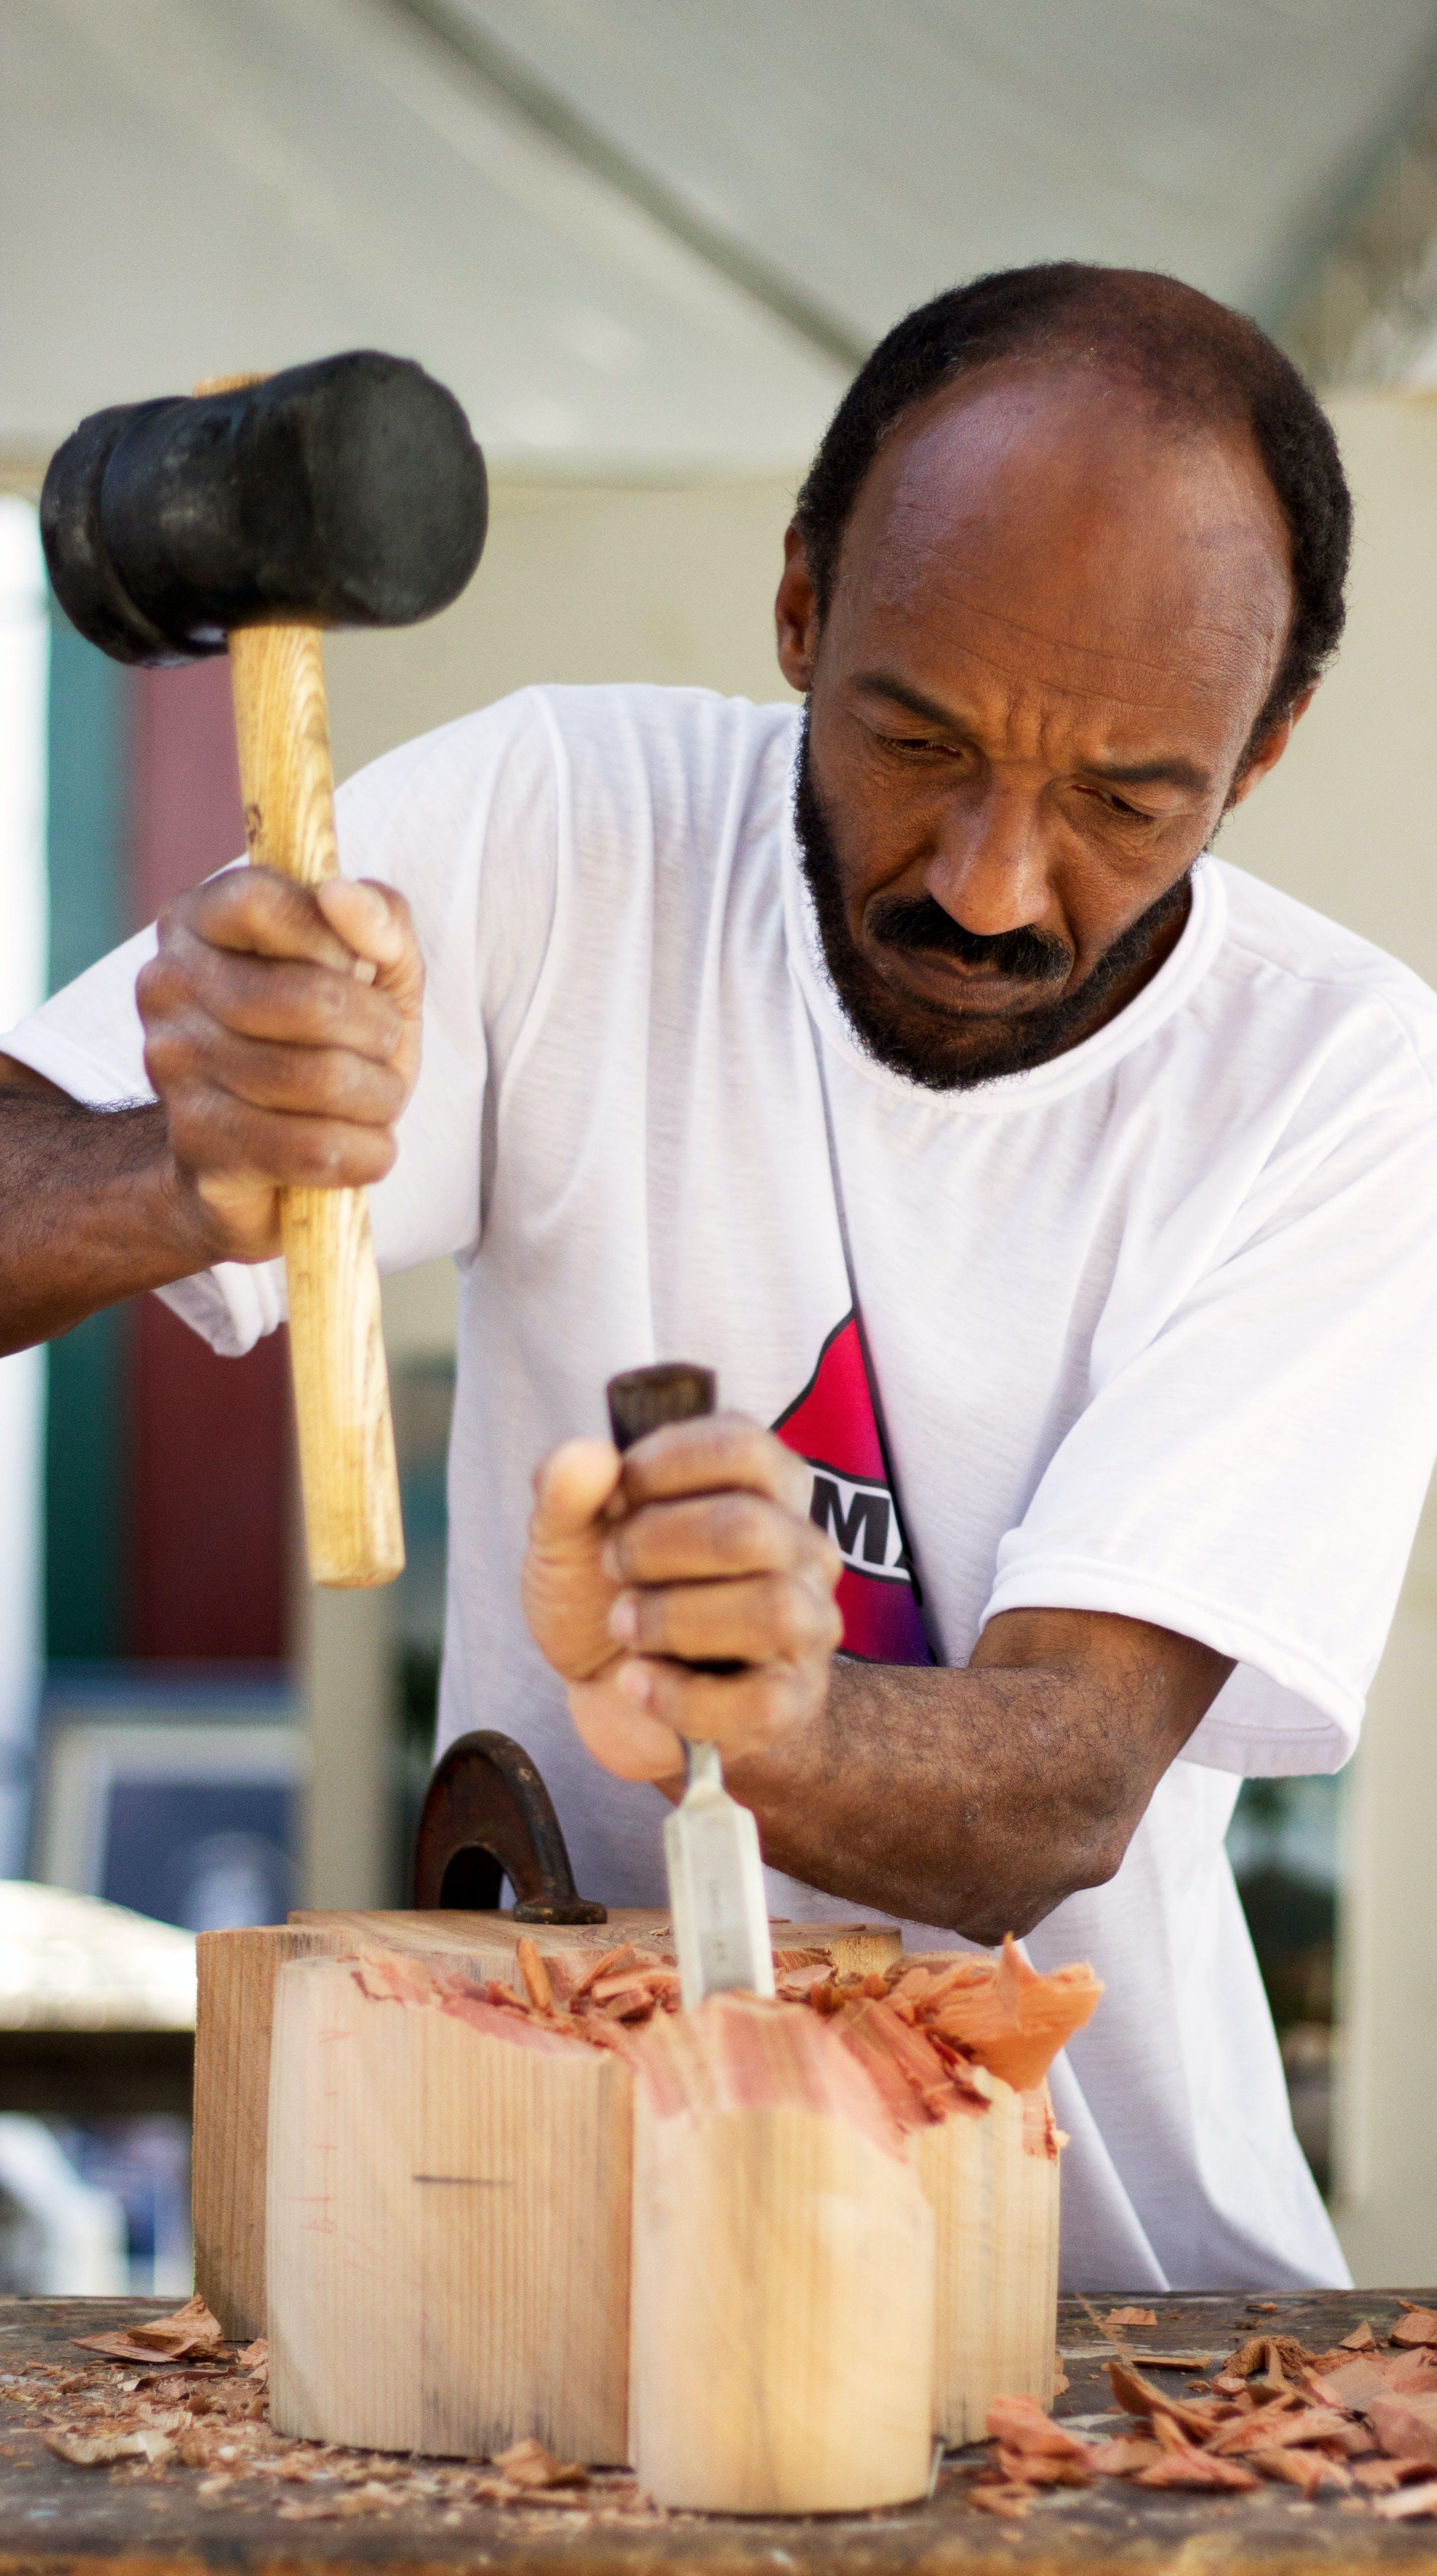 Free stock photo of wood, man, art, working